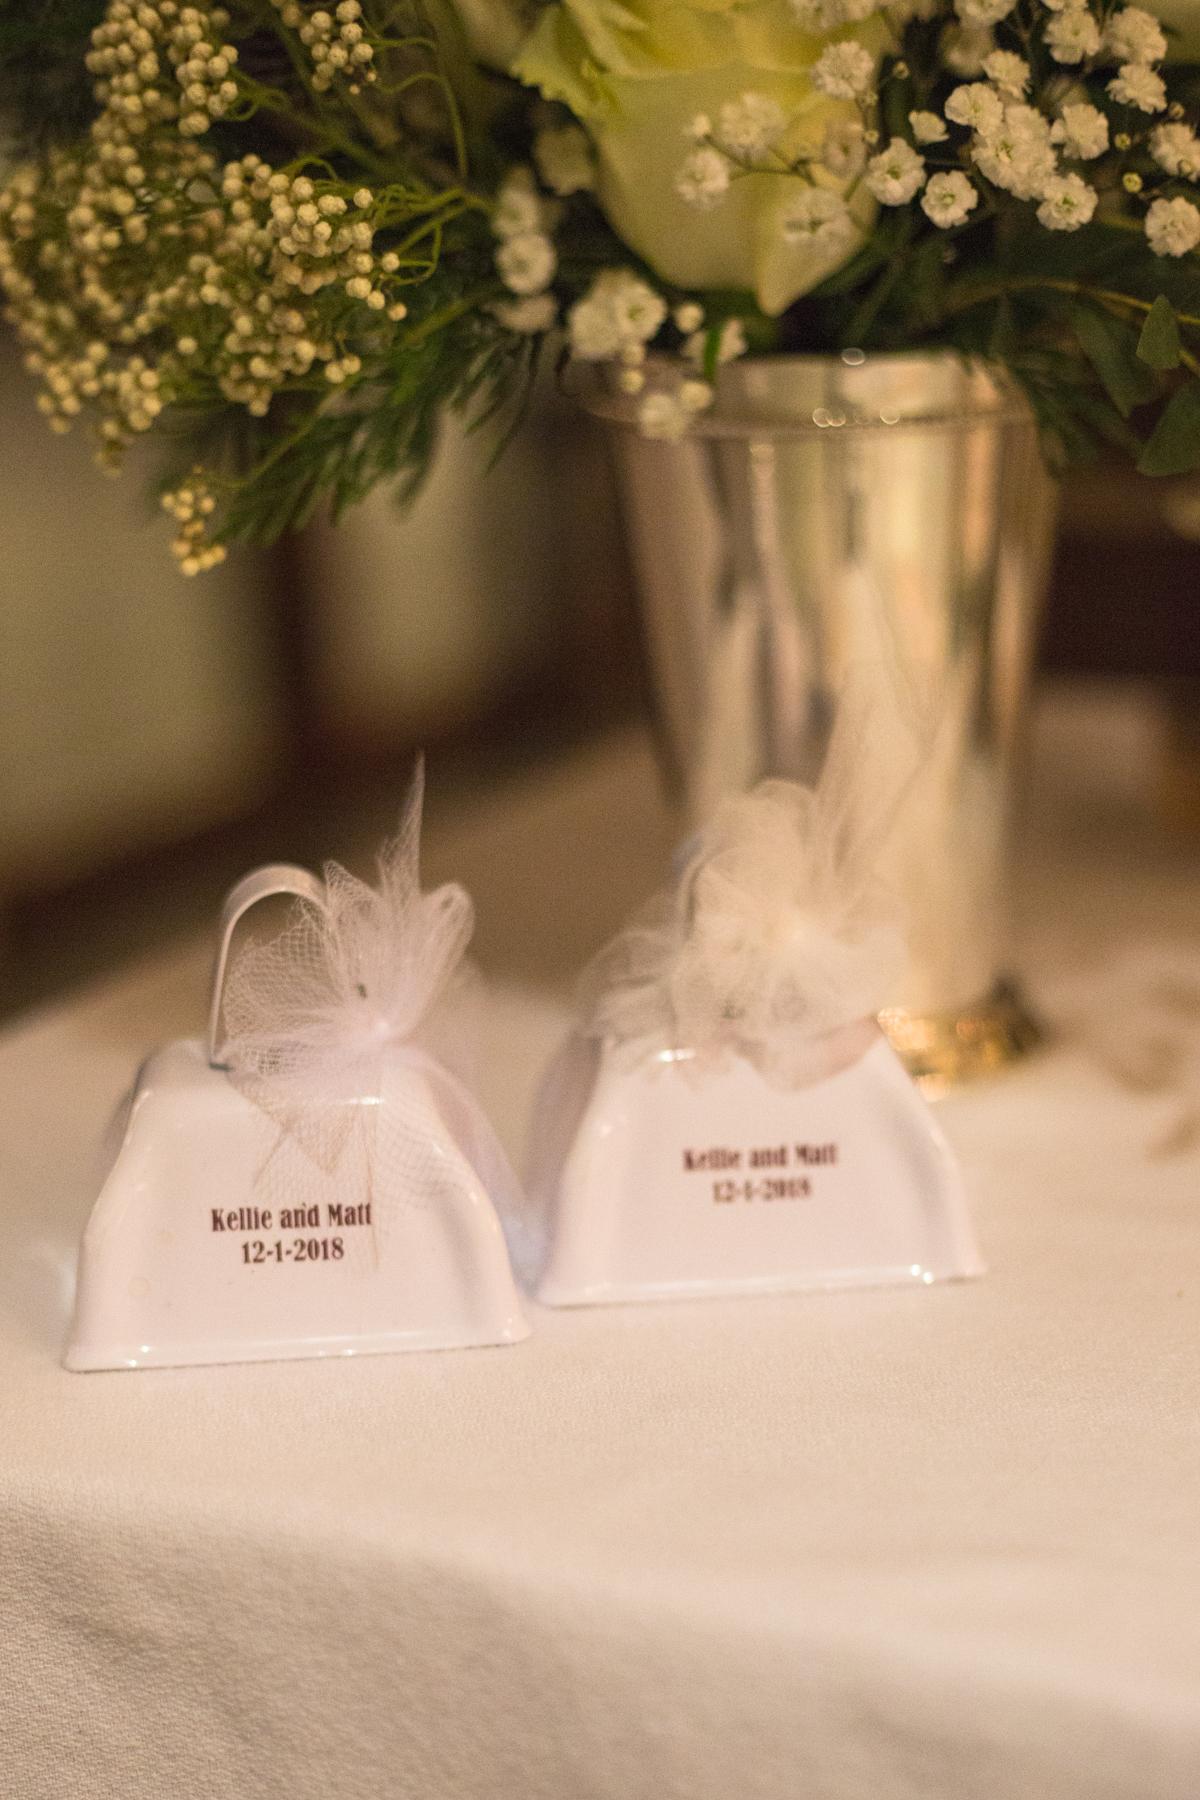 Kelli-and-Matt-Nashville-Wedding-Sneak-Peak-0289.jpg